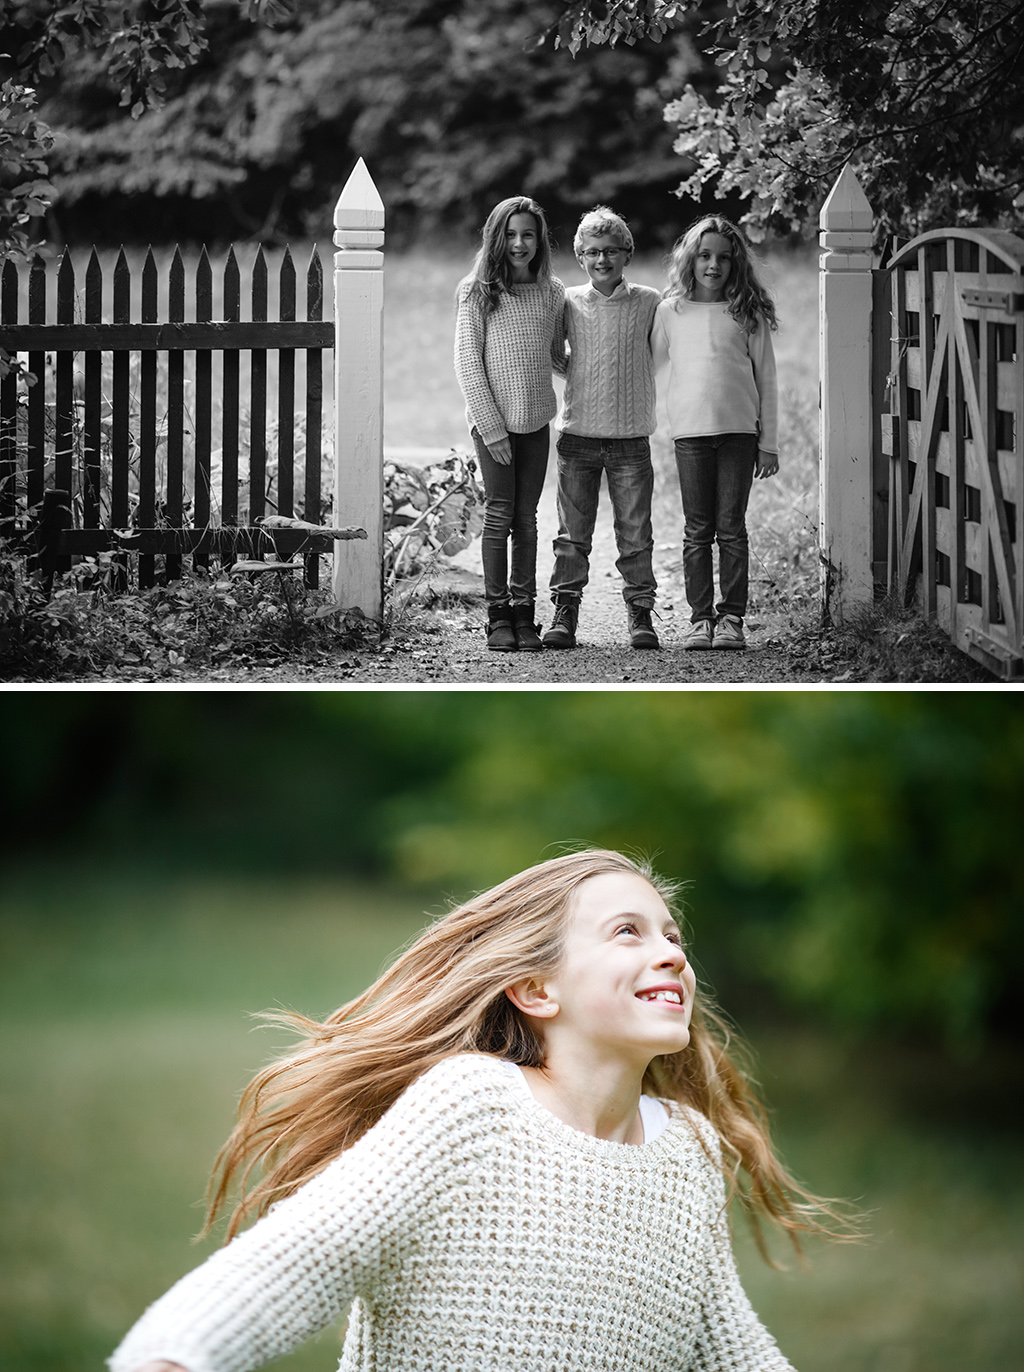 Familjefotografering_i-Stockholm_Lifestyle-familjefotograf-Anna-Sandstrom_14.jpg